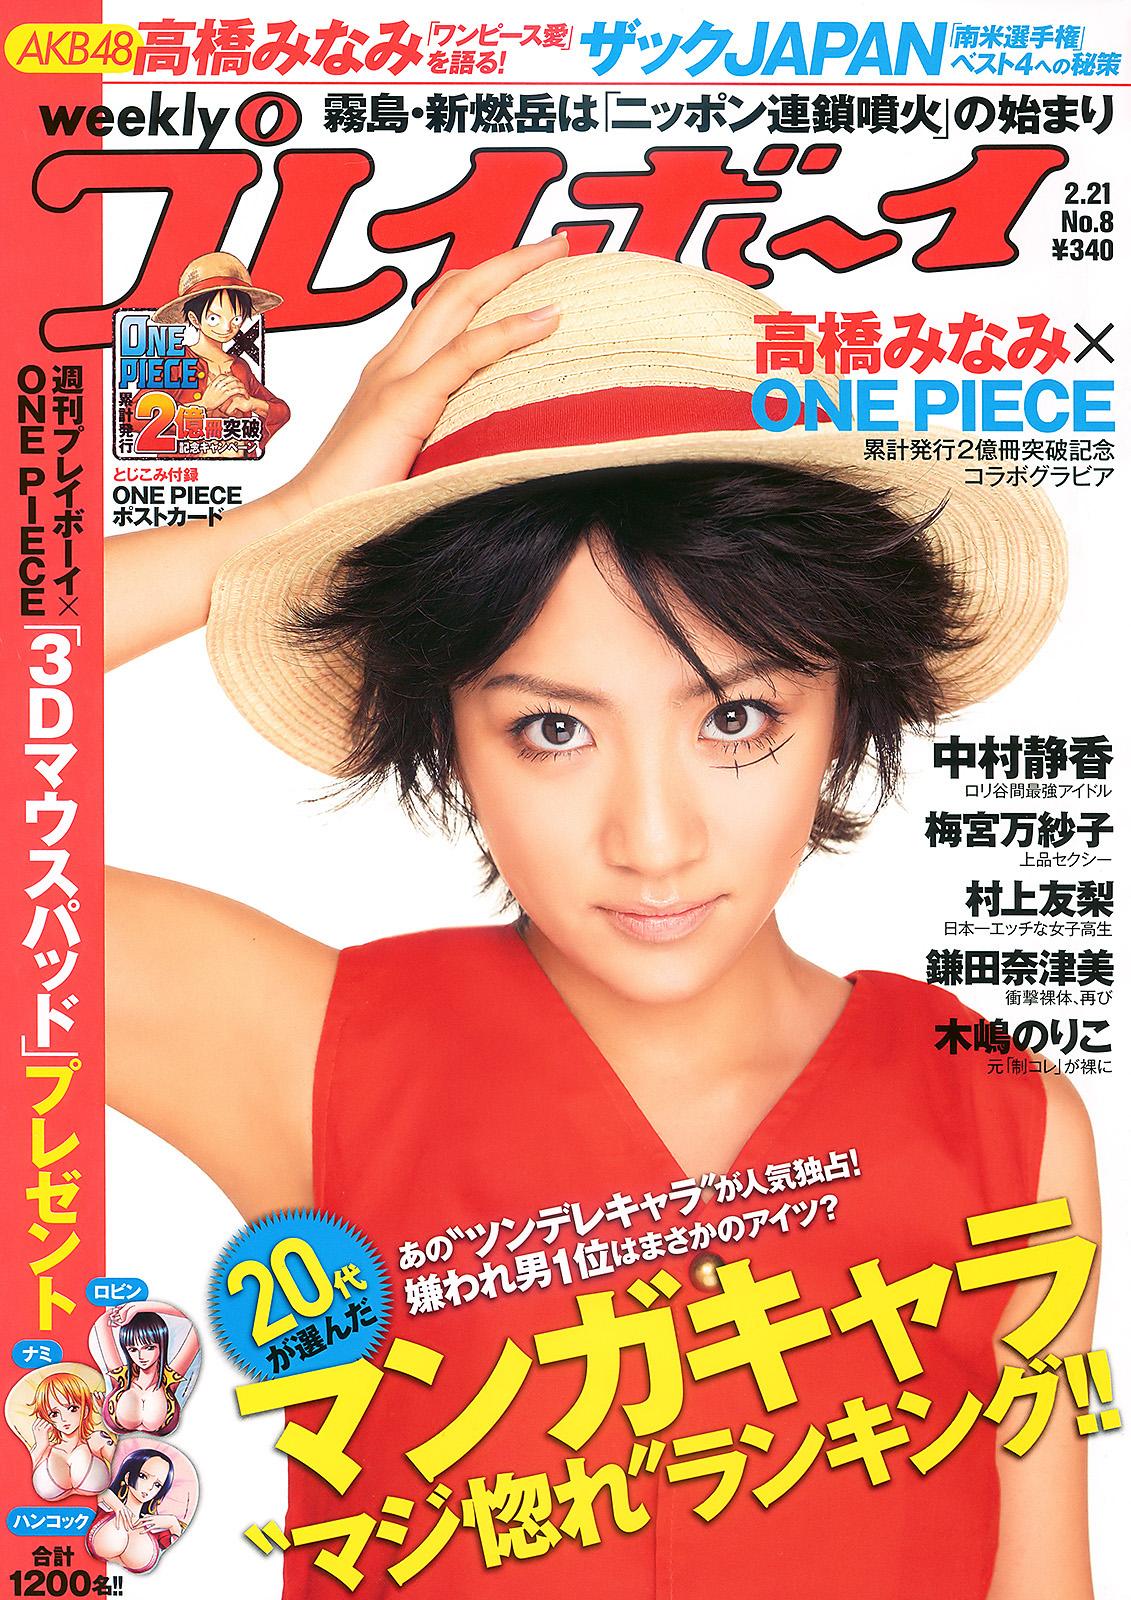 Weekly Playboy - 21 February 2011 (N° 8)